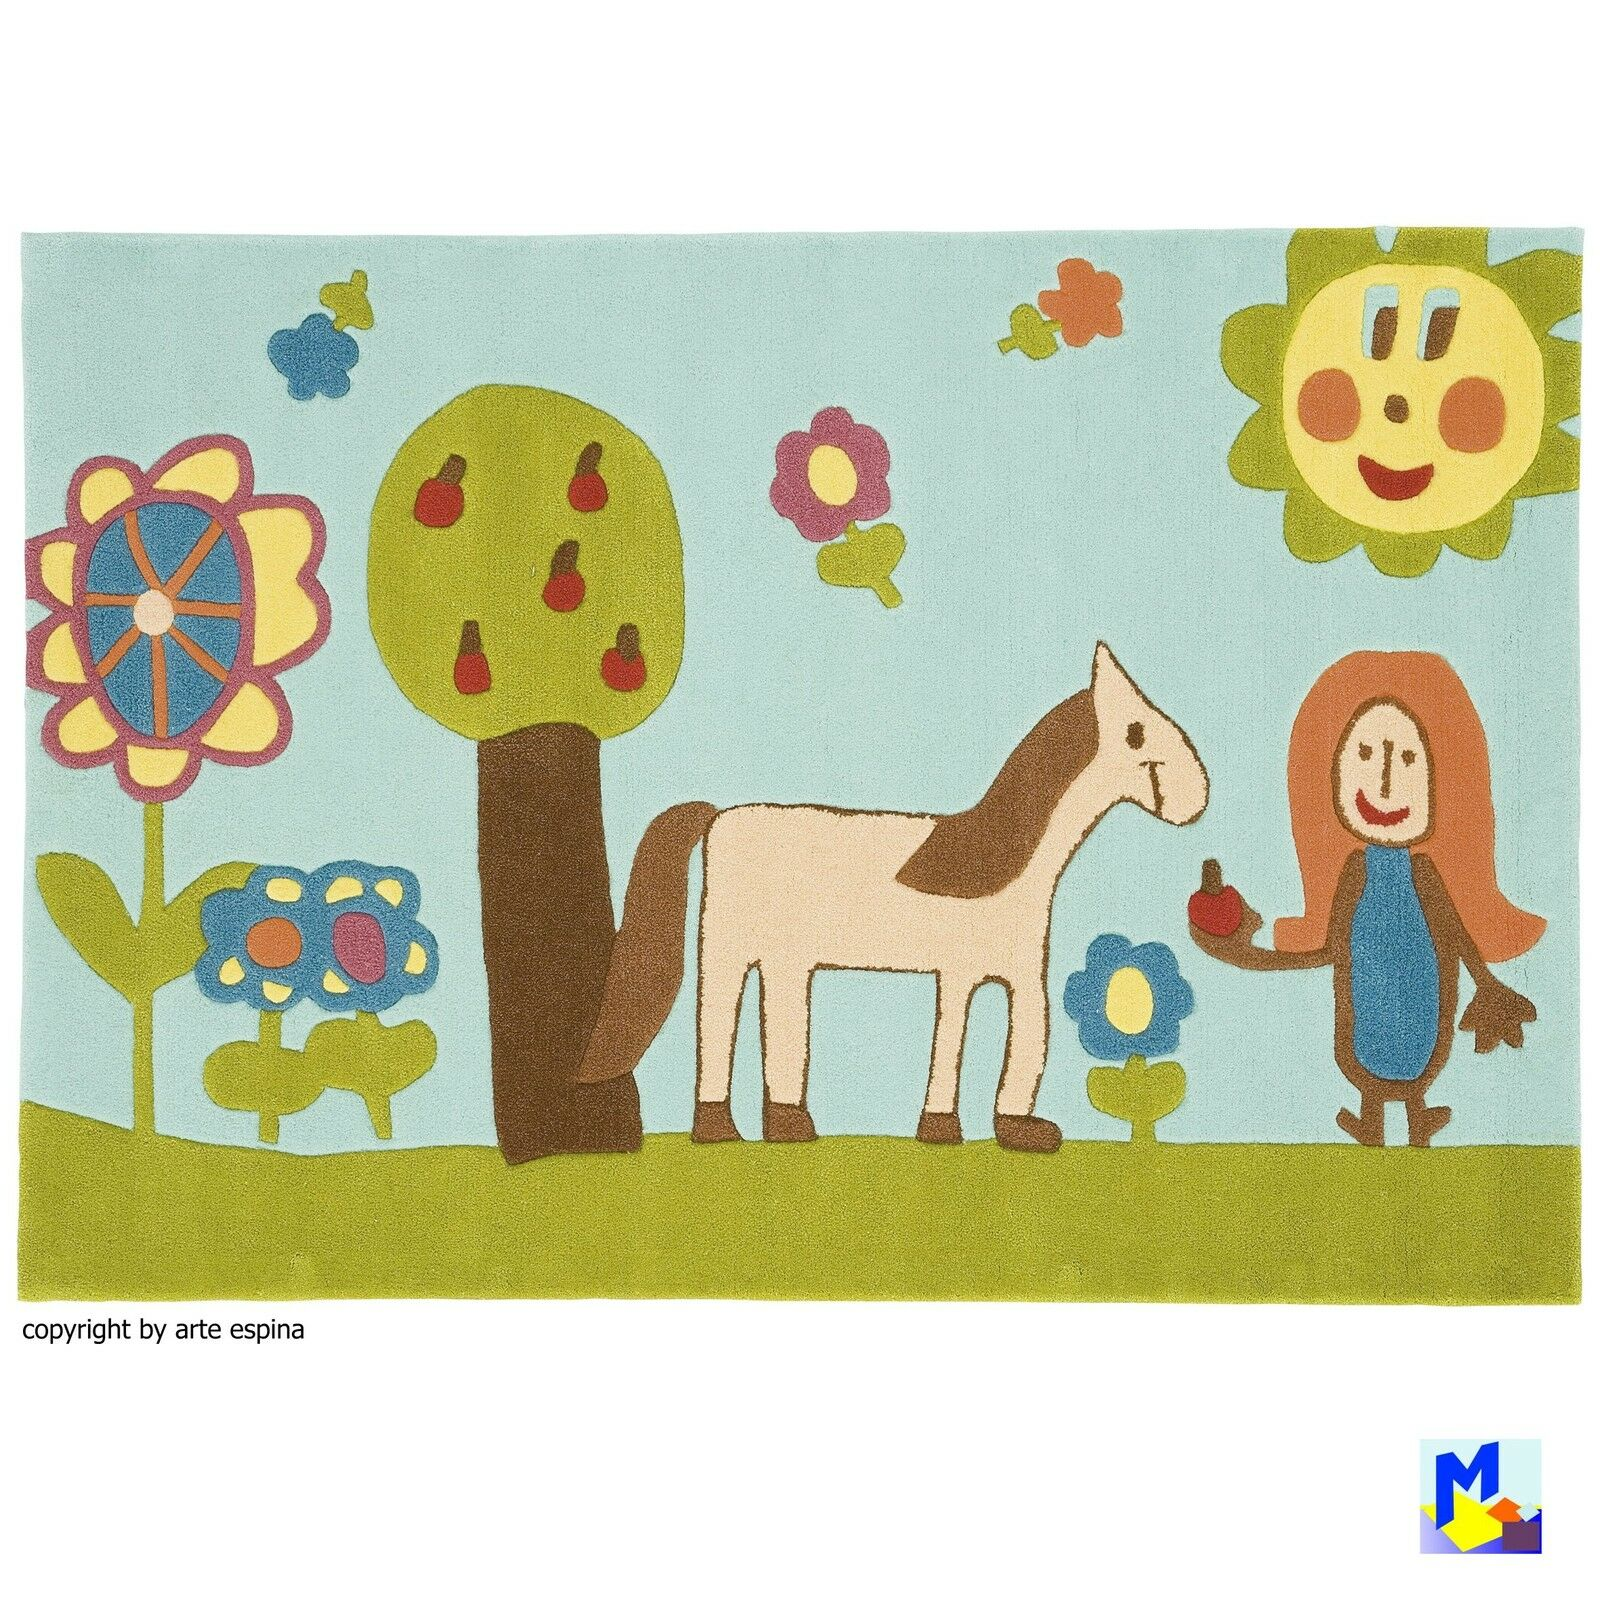 Soldes  Arte Espina tapis HANDTUFT 4038-52 filles, cheval et fleurs 110x160 CM